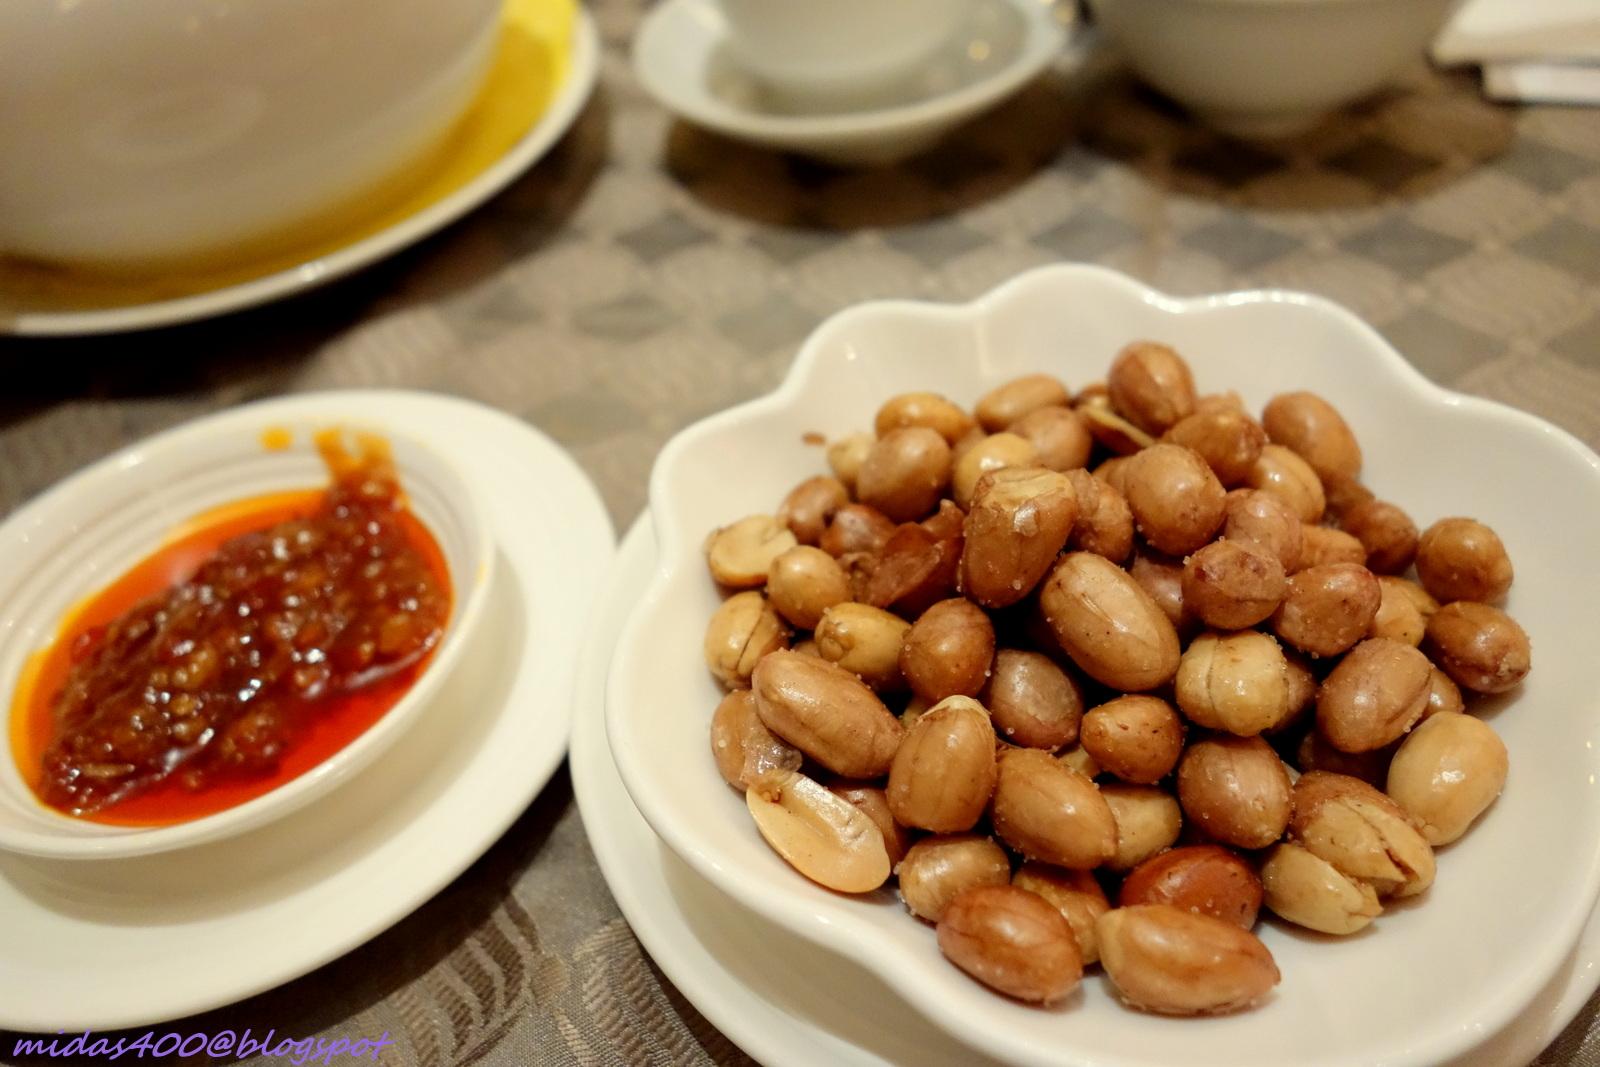 Midas food n travel blog lunch at 456 modern shanghai for Ala shanghai chinese cuisine menu